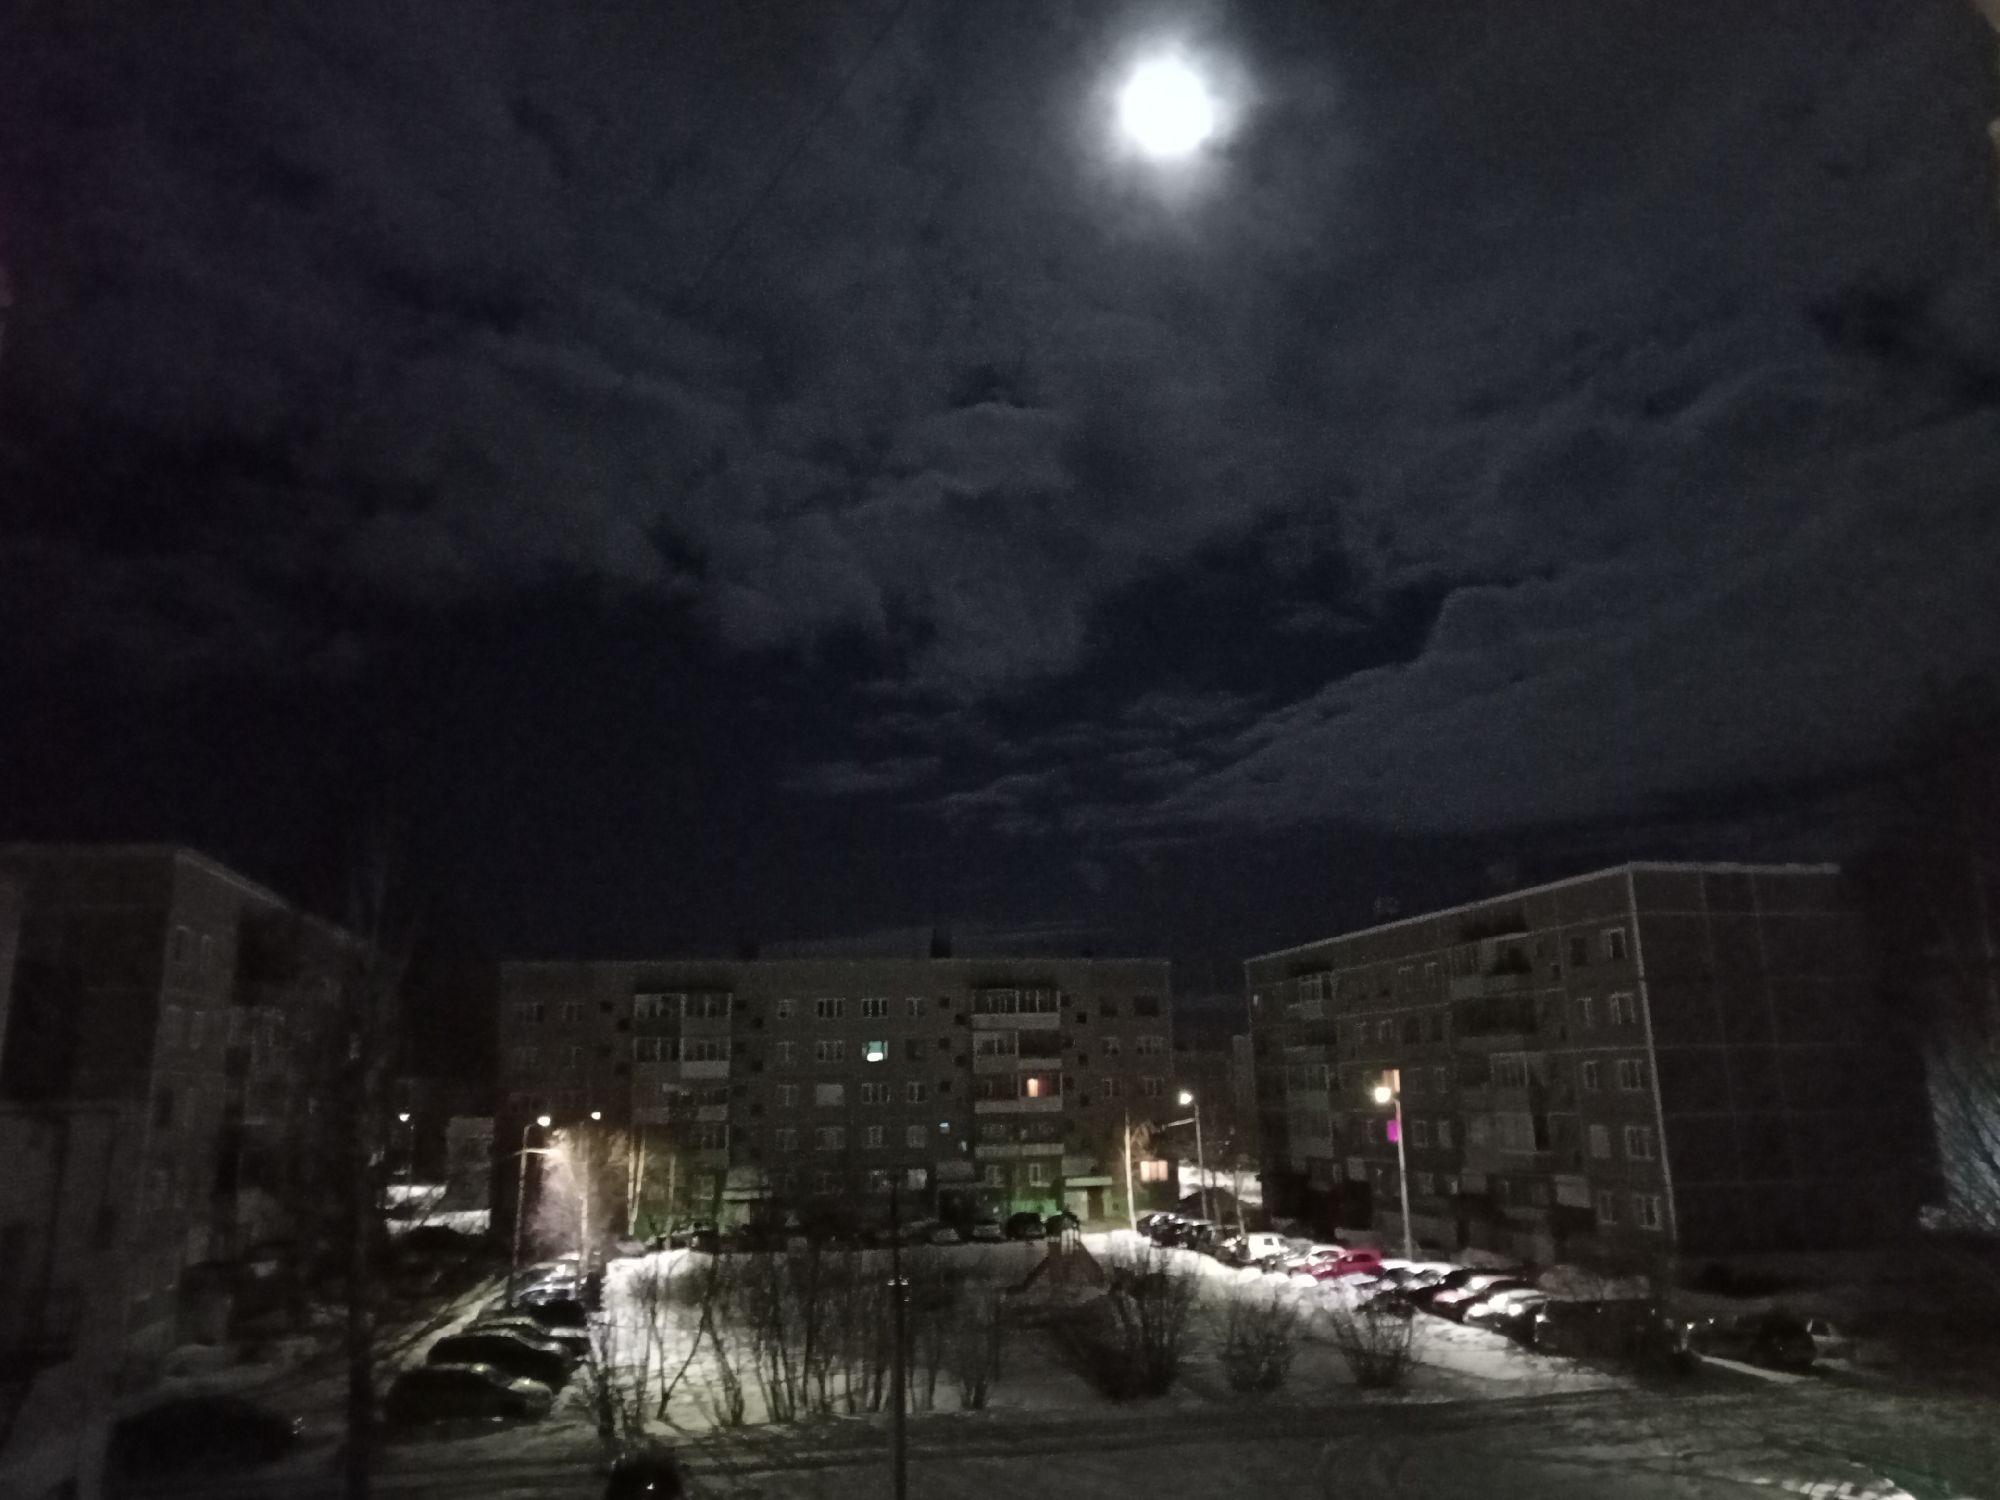 Ночное весеннее небо. Коряжма, вид из окна. 26/27 марта 2021. На мобильник.